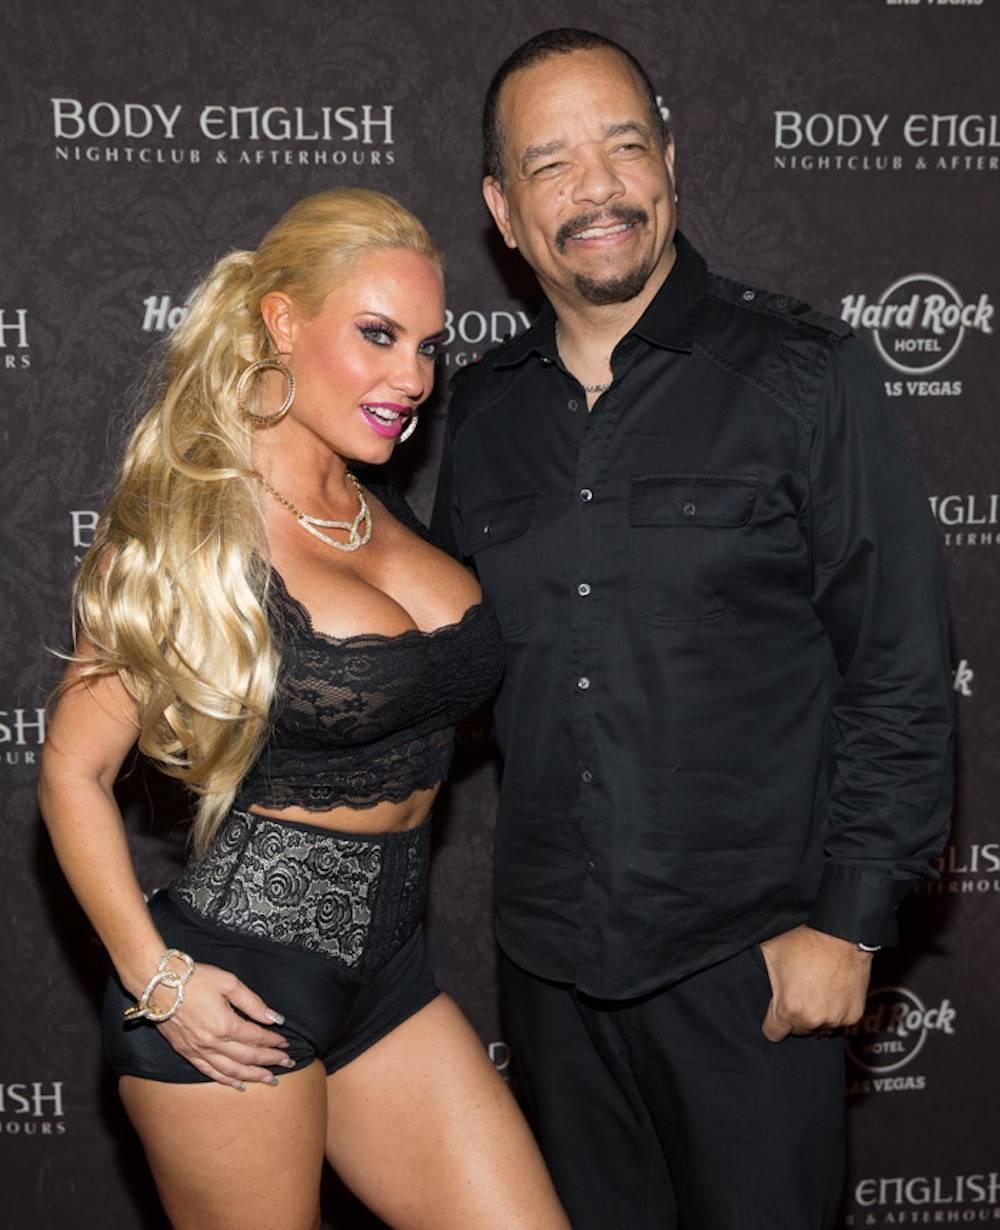 9.1.13 Coco and Ice-T at Body English Nightclub & Afterhours Hard Rock Hotel & Casino, photo credit Erik Kabik